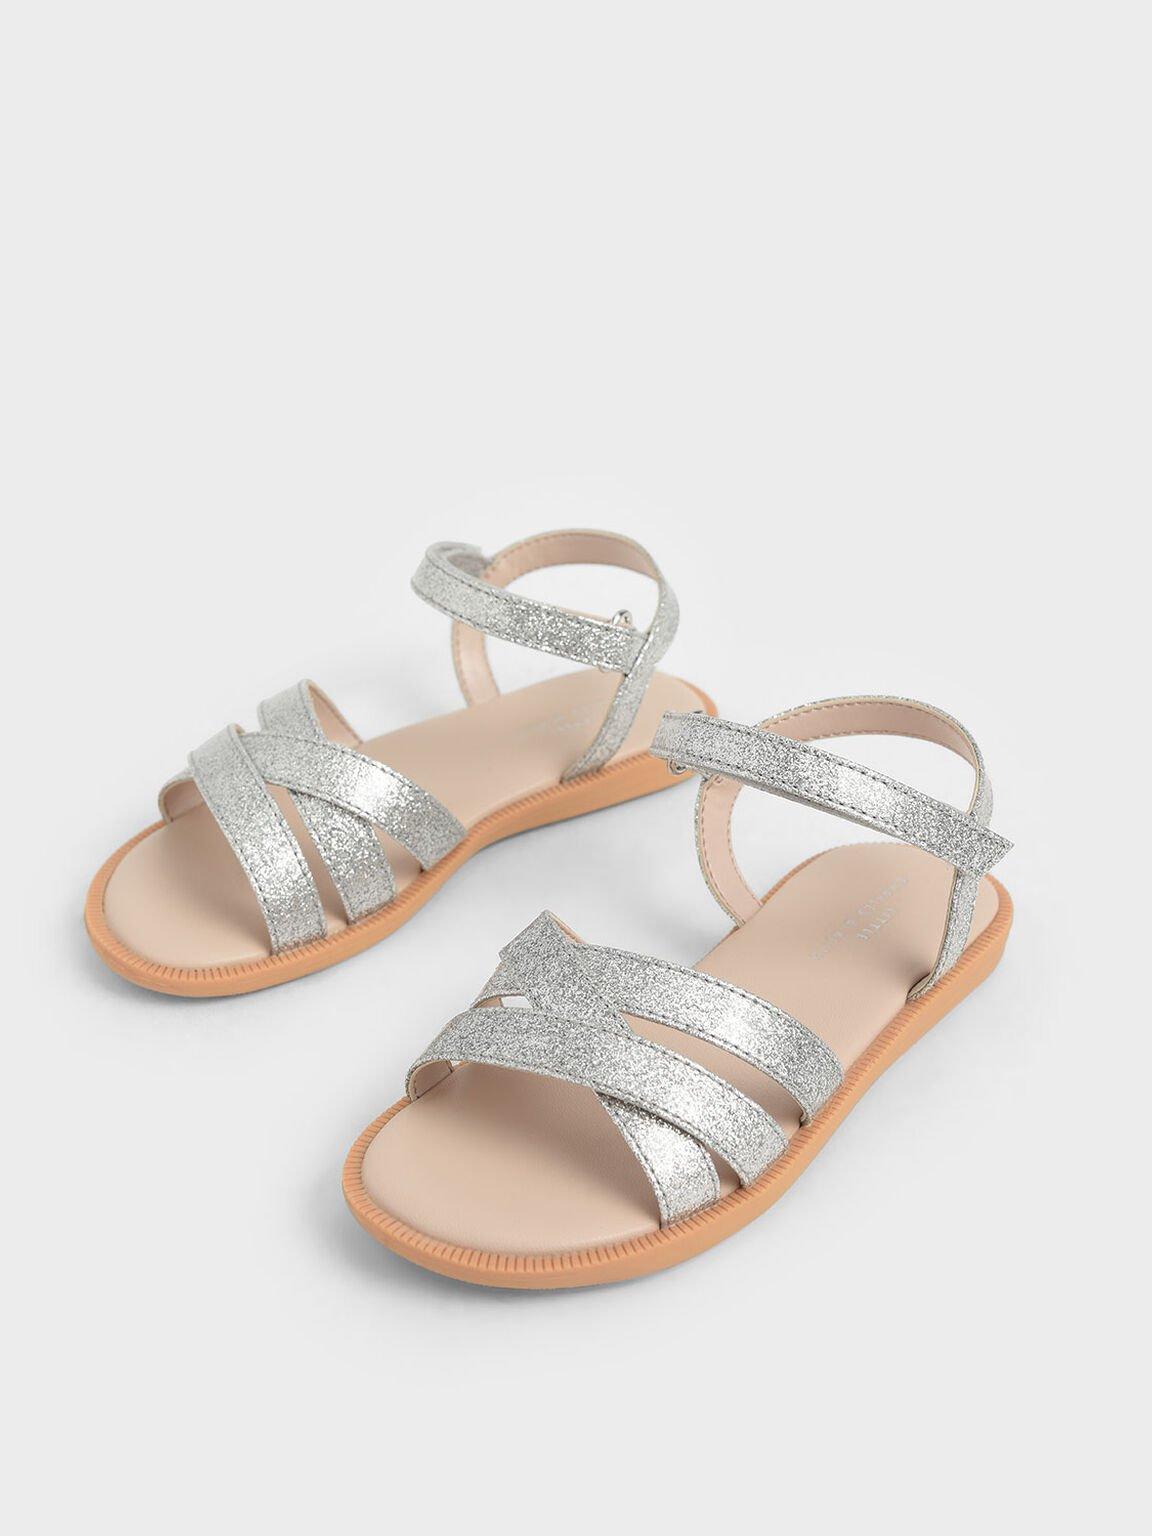 Girls' Glitter Strappy Sandals, Silver, hi-res